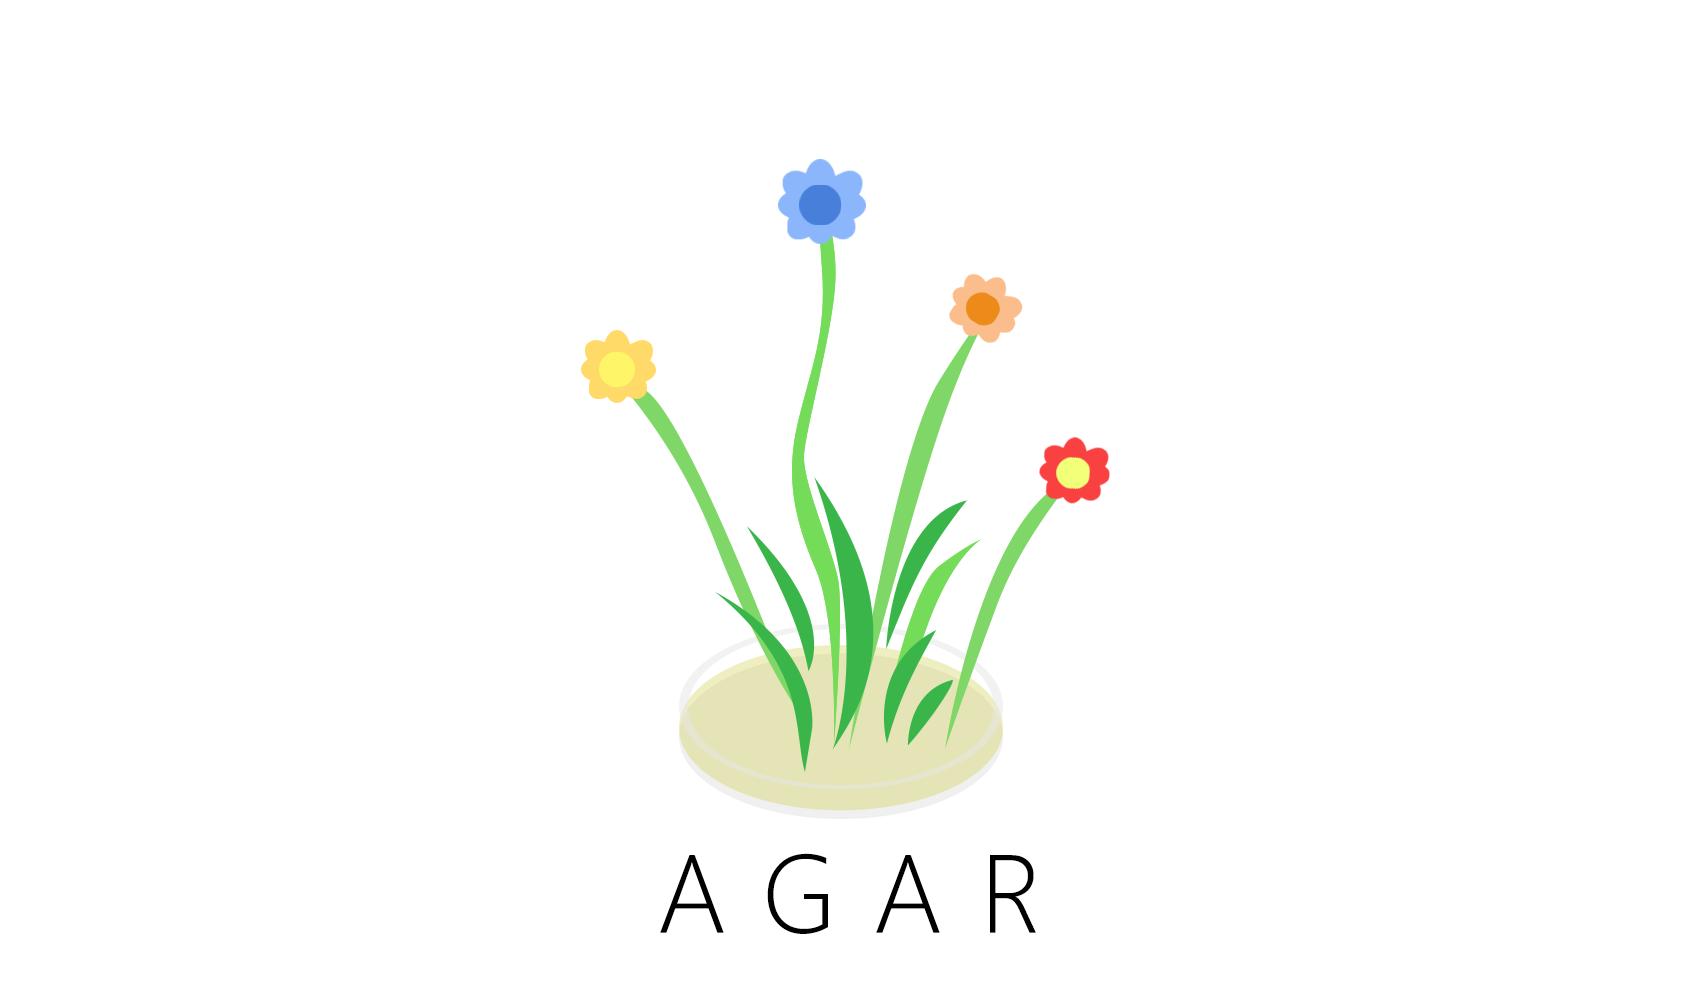 Project Agar